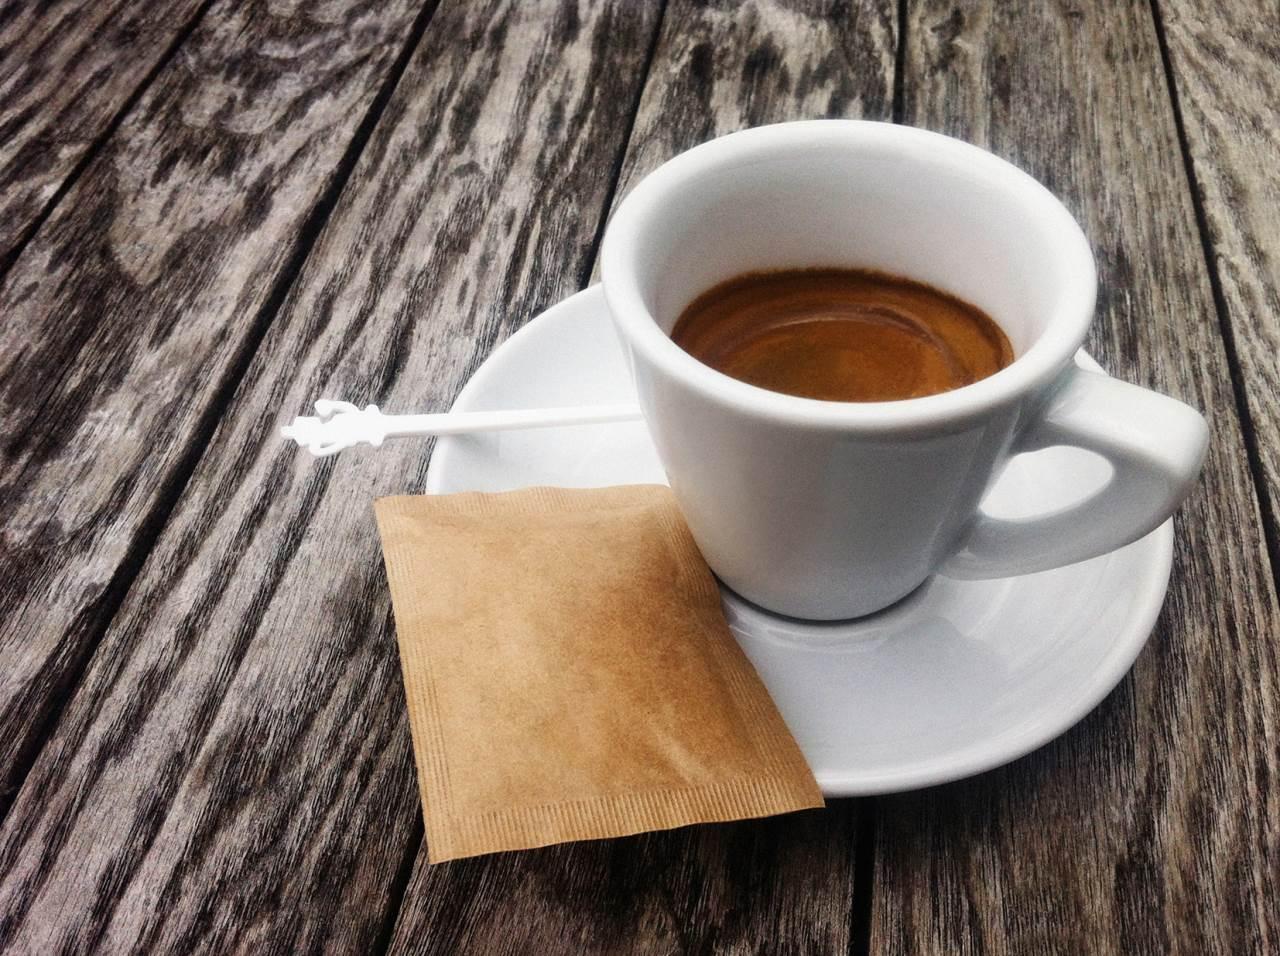 Time for a coffee - vjeran2001 (sxc.hu)